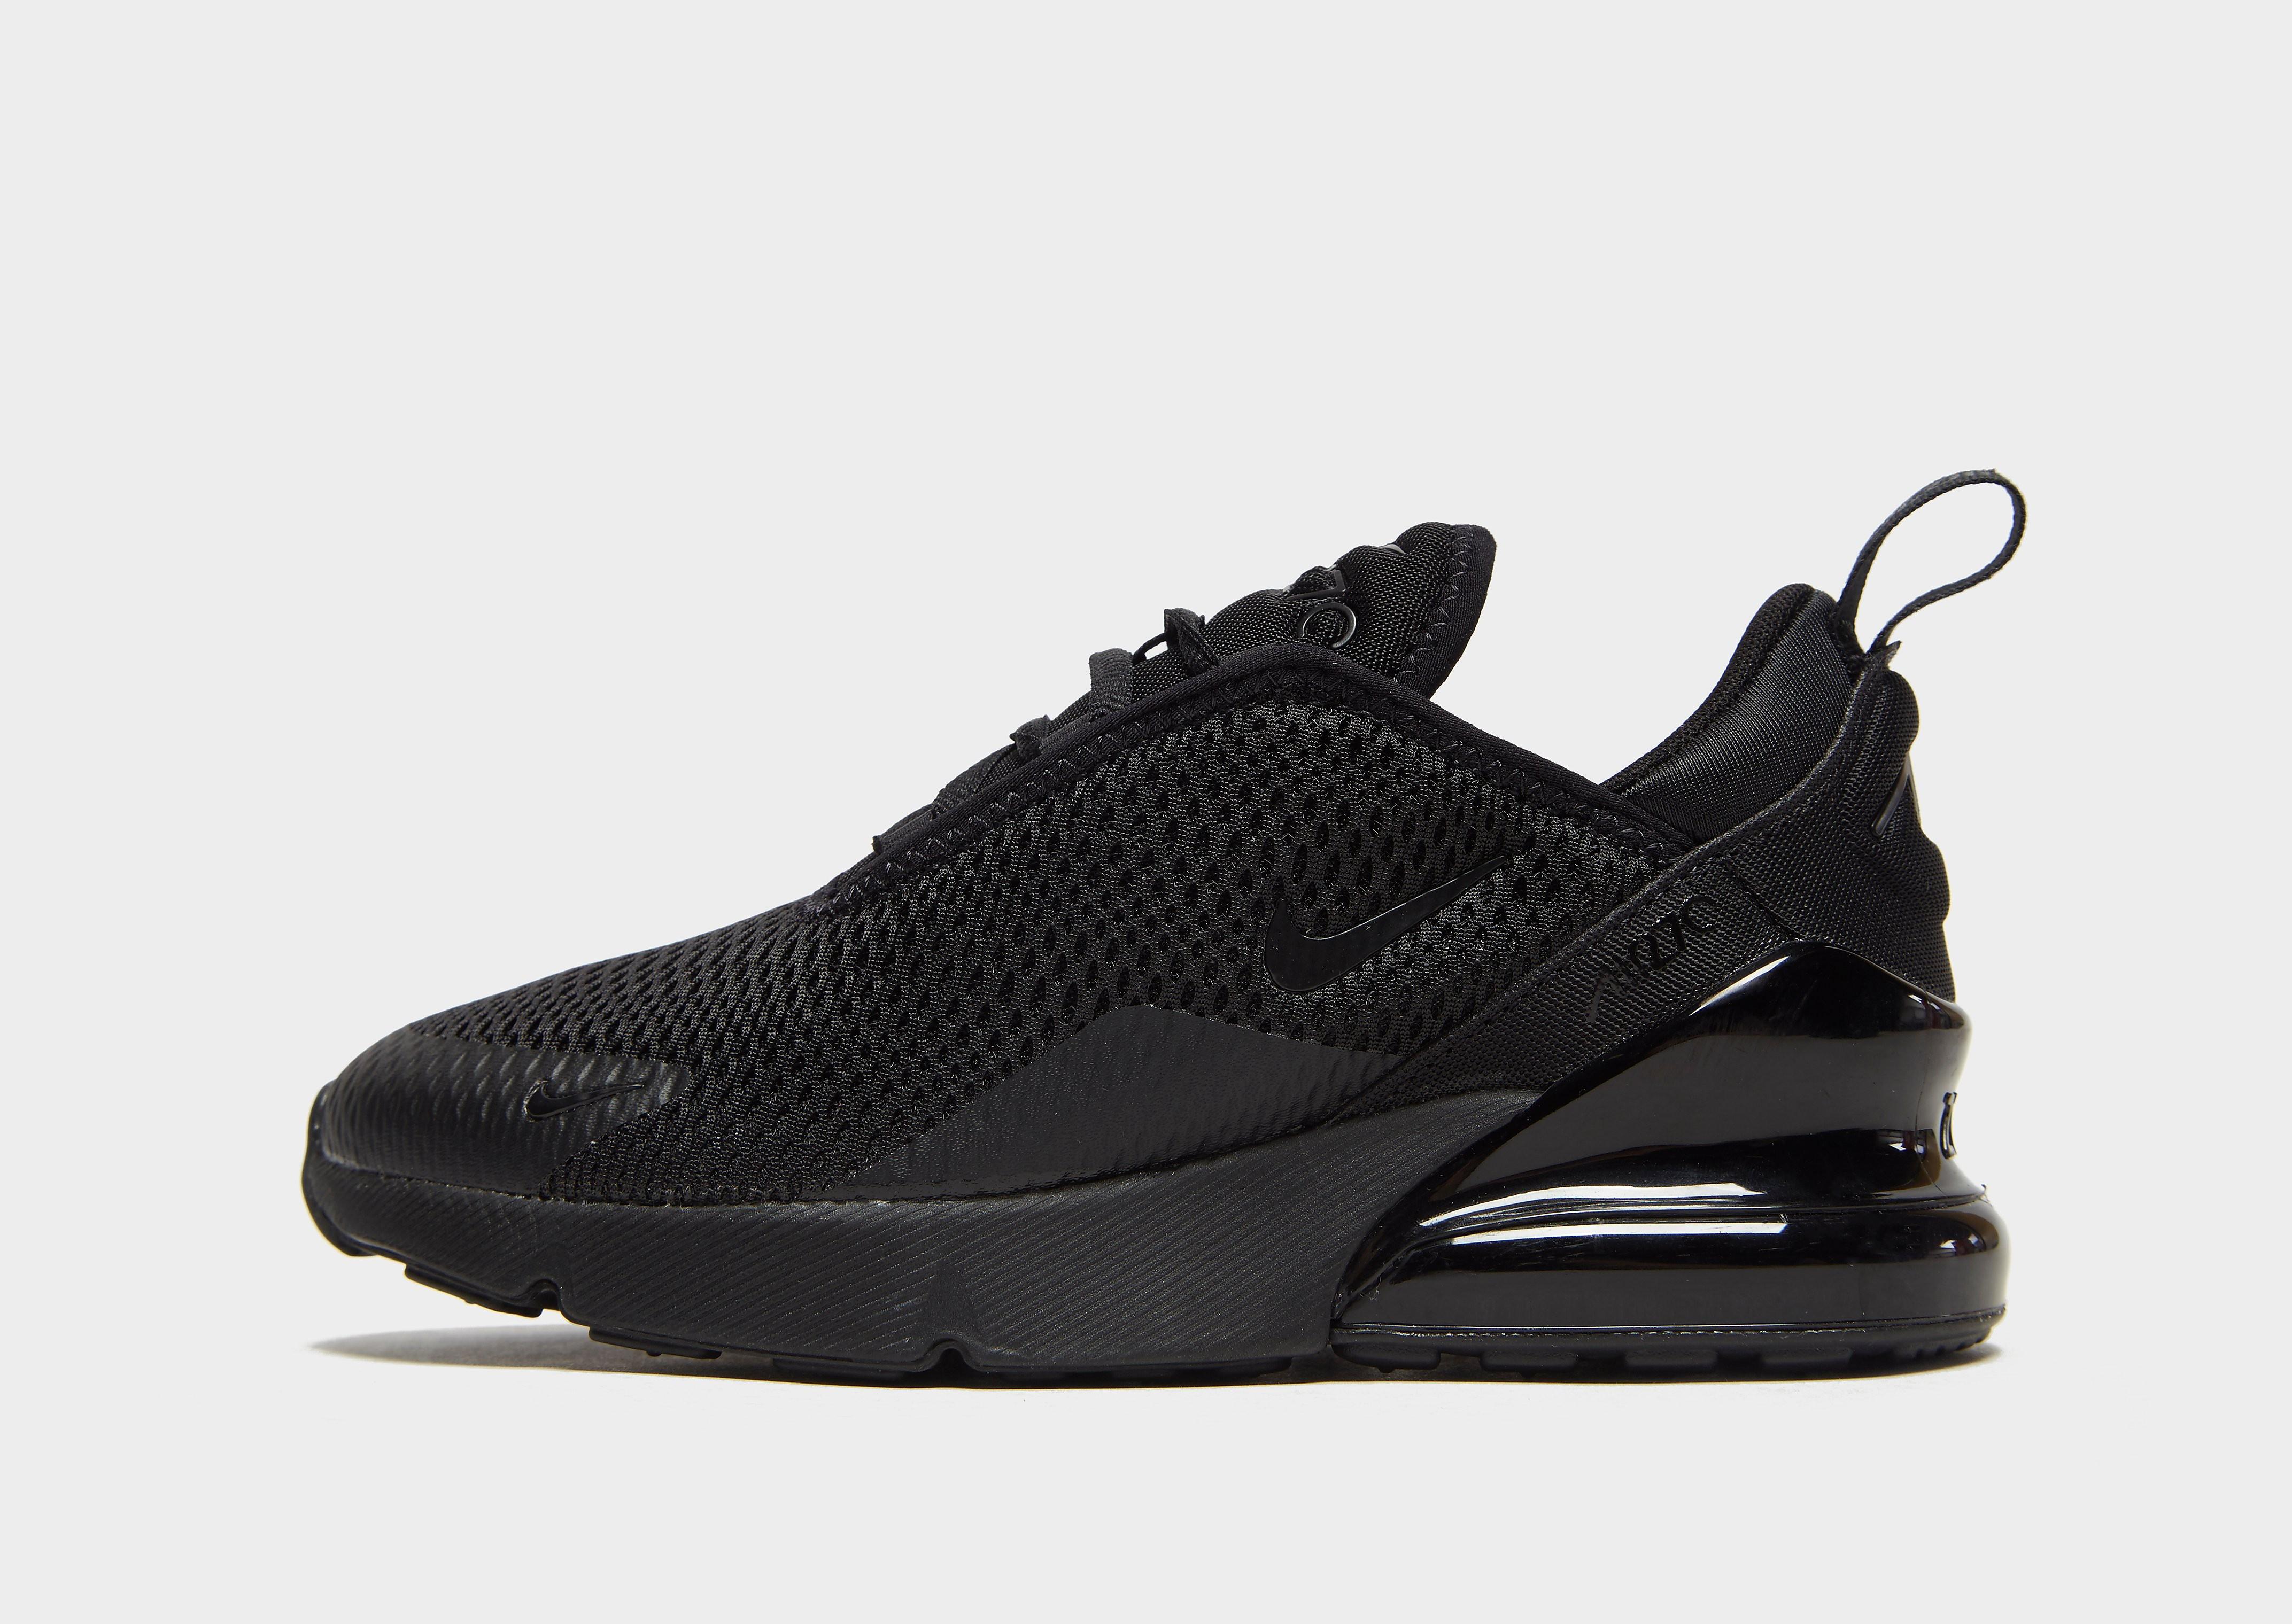 a405b5f4f95c Precios de sneakers Nike Air Max 270 baratas - Ofertas para comprar ...